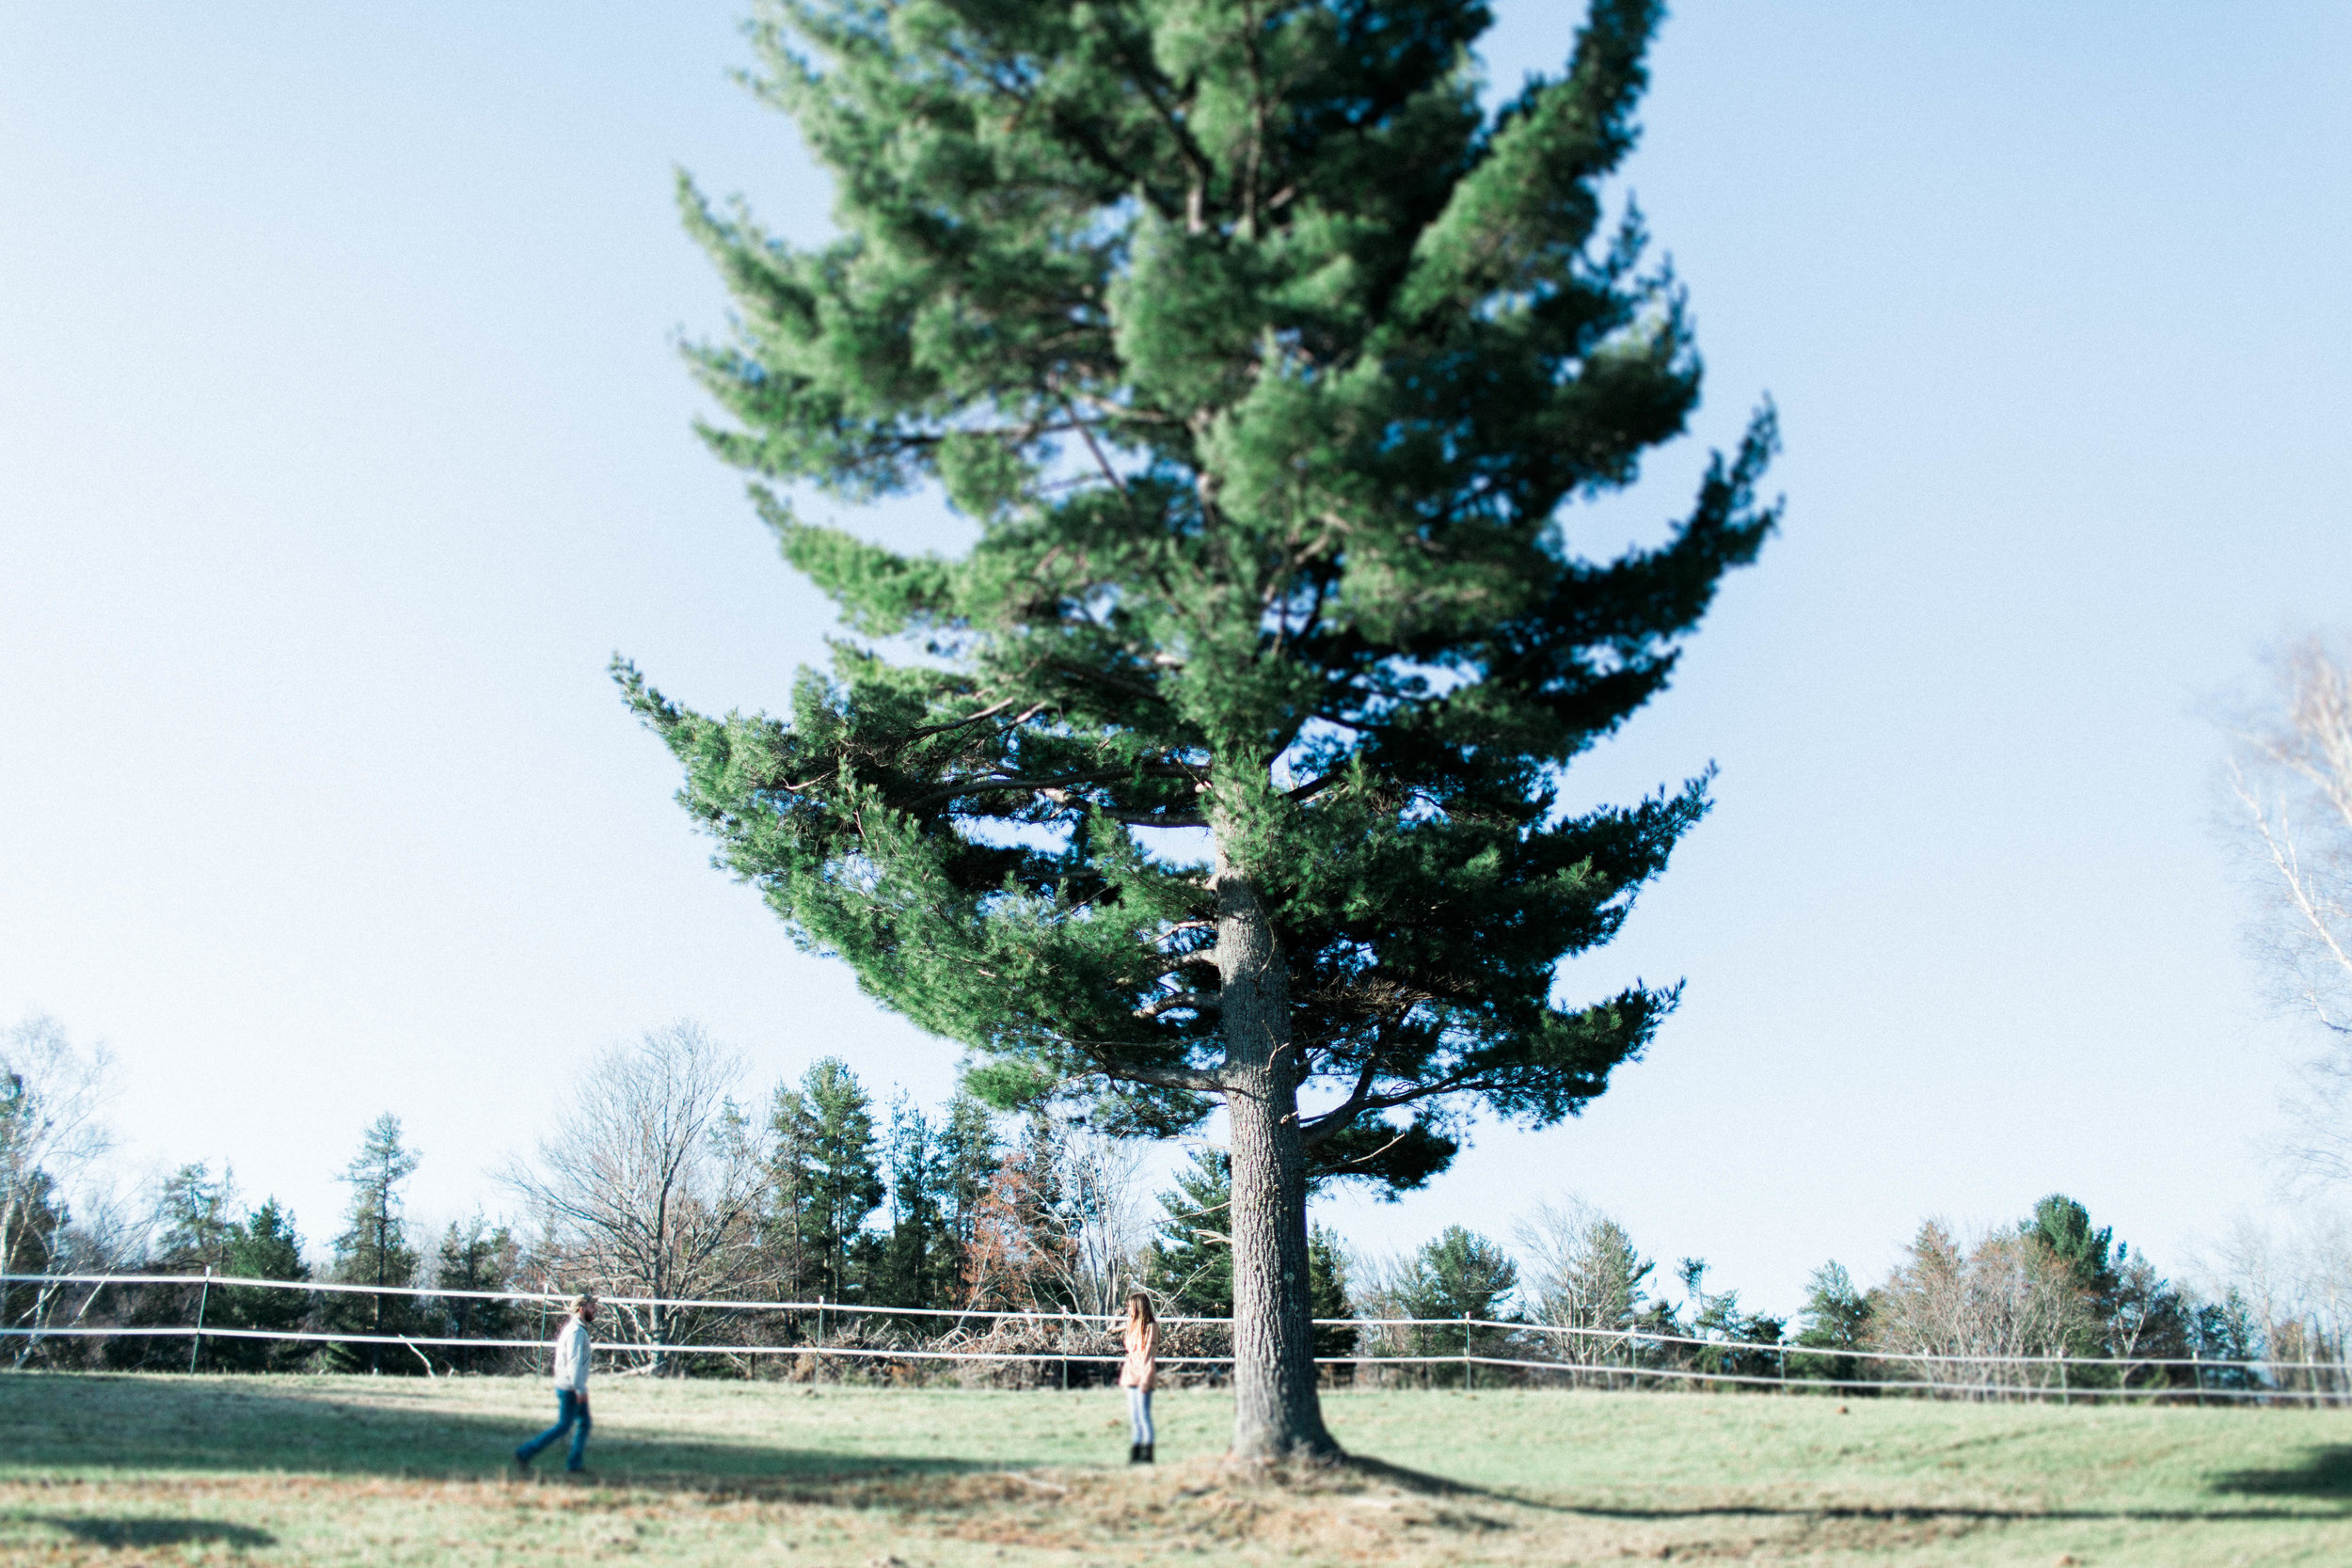 Horse Farm Engagment - Sabrina Leigh Studios - Northern Michigan Wedding Photographer 35.jpg